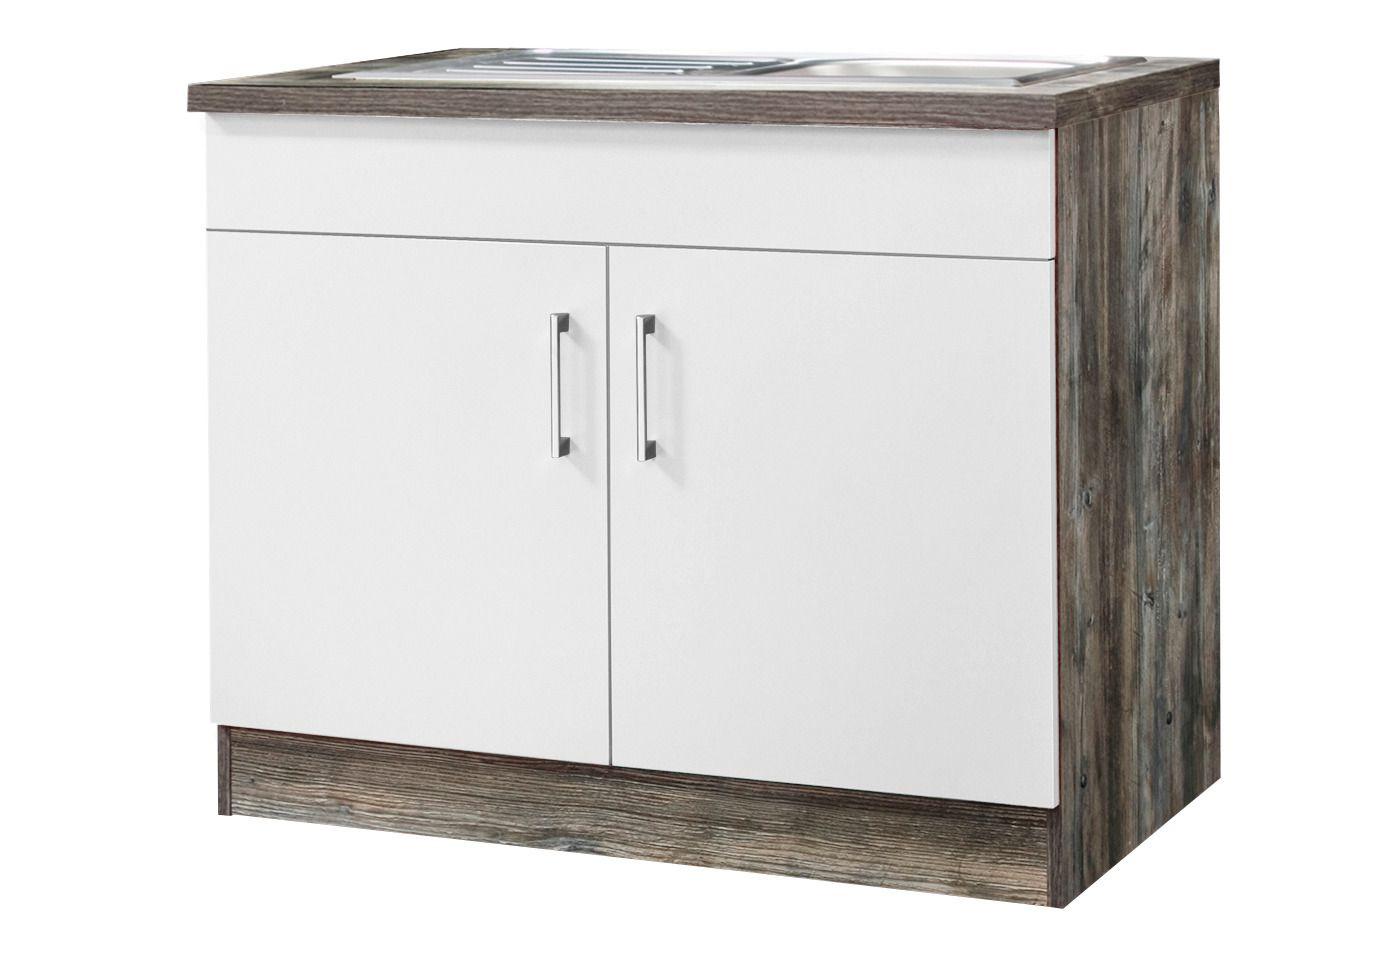 sp lenschrank sevilla breite 100 cm schwab versand. Black Bedroom Furniture Sets. Home Design Ideas